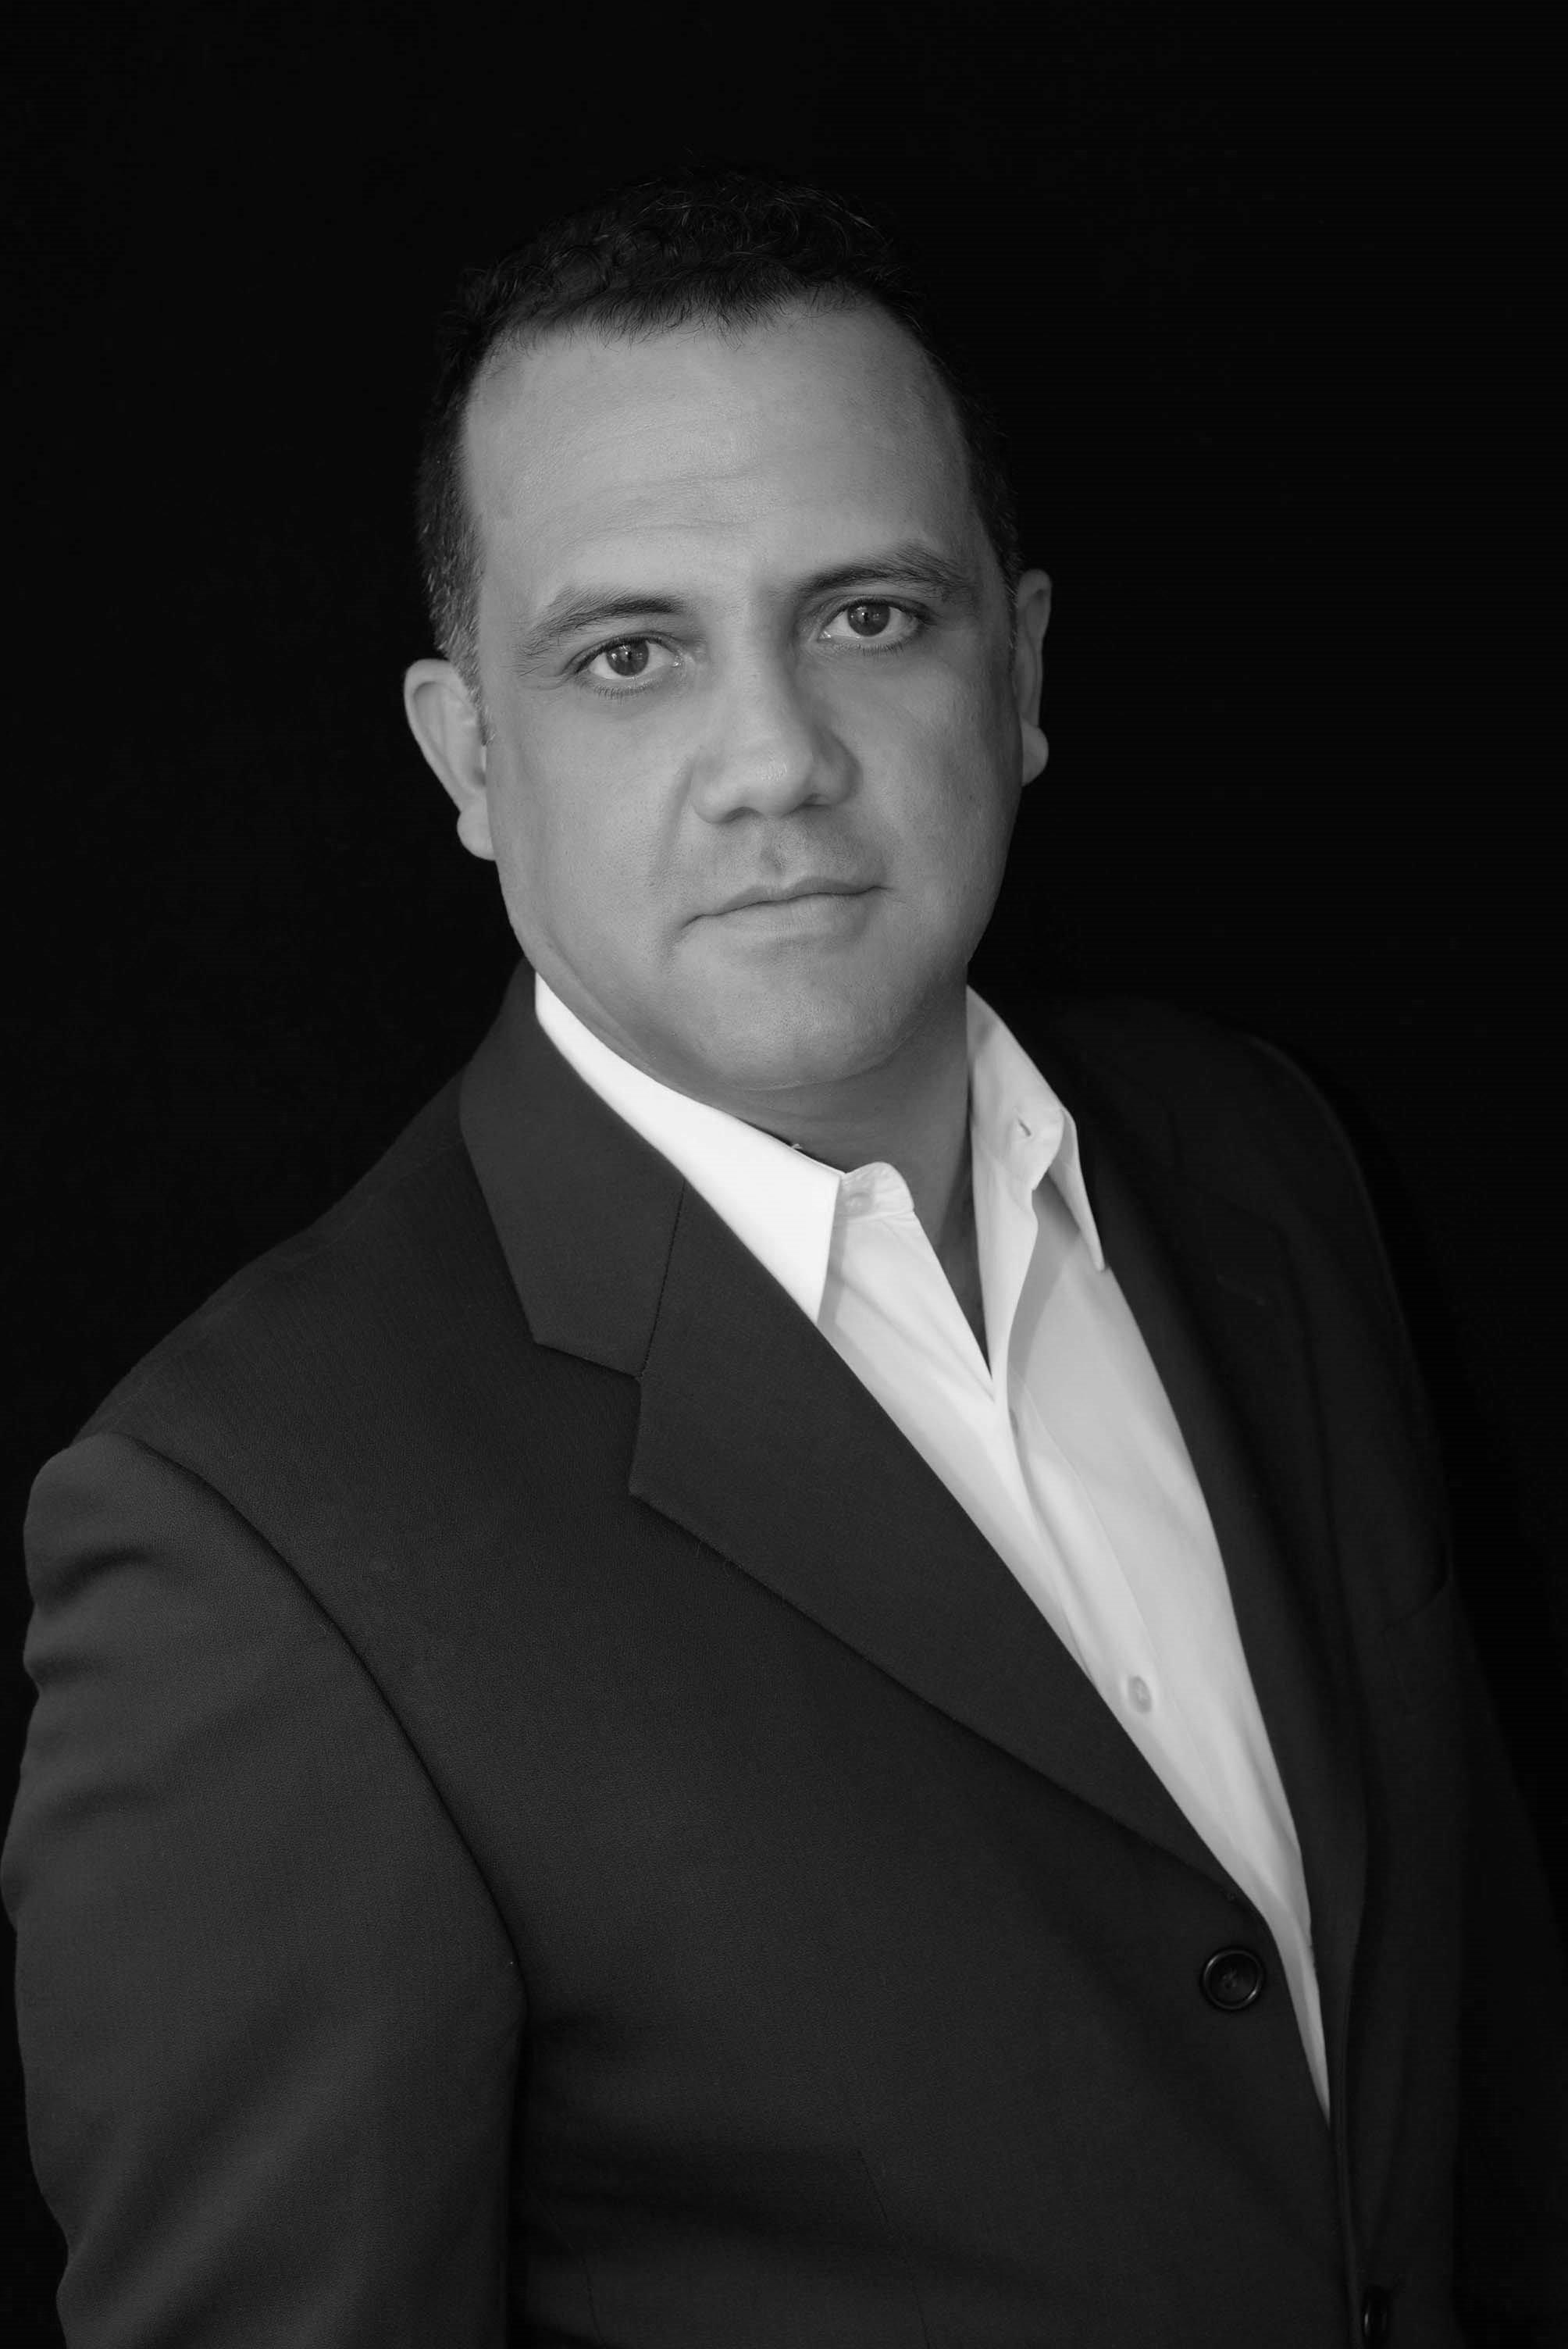 Eduardo Cubillan